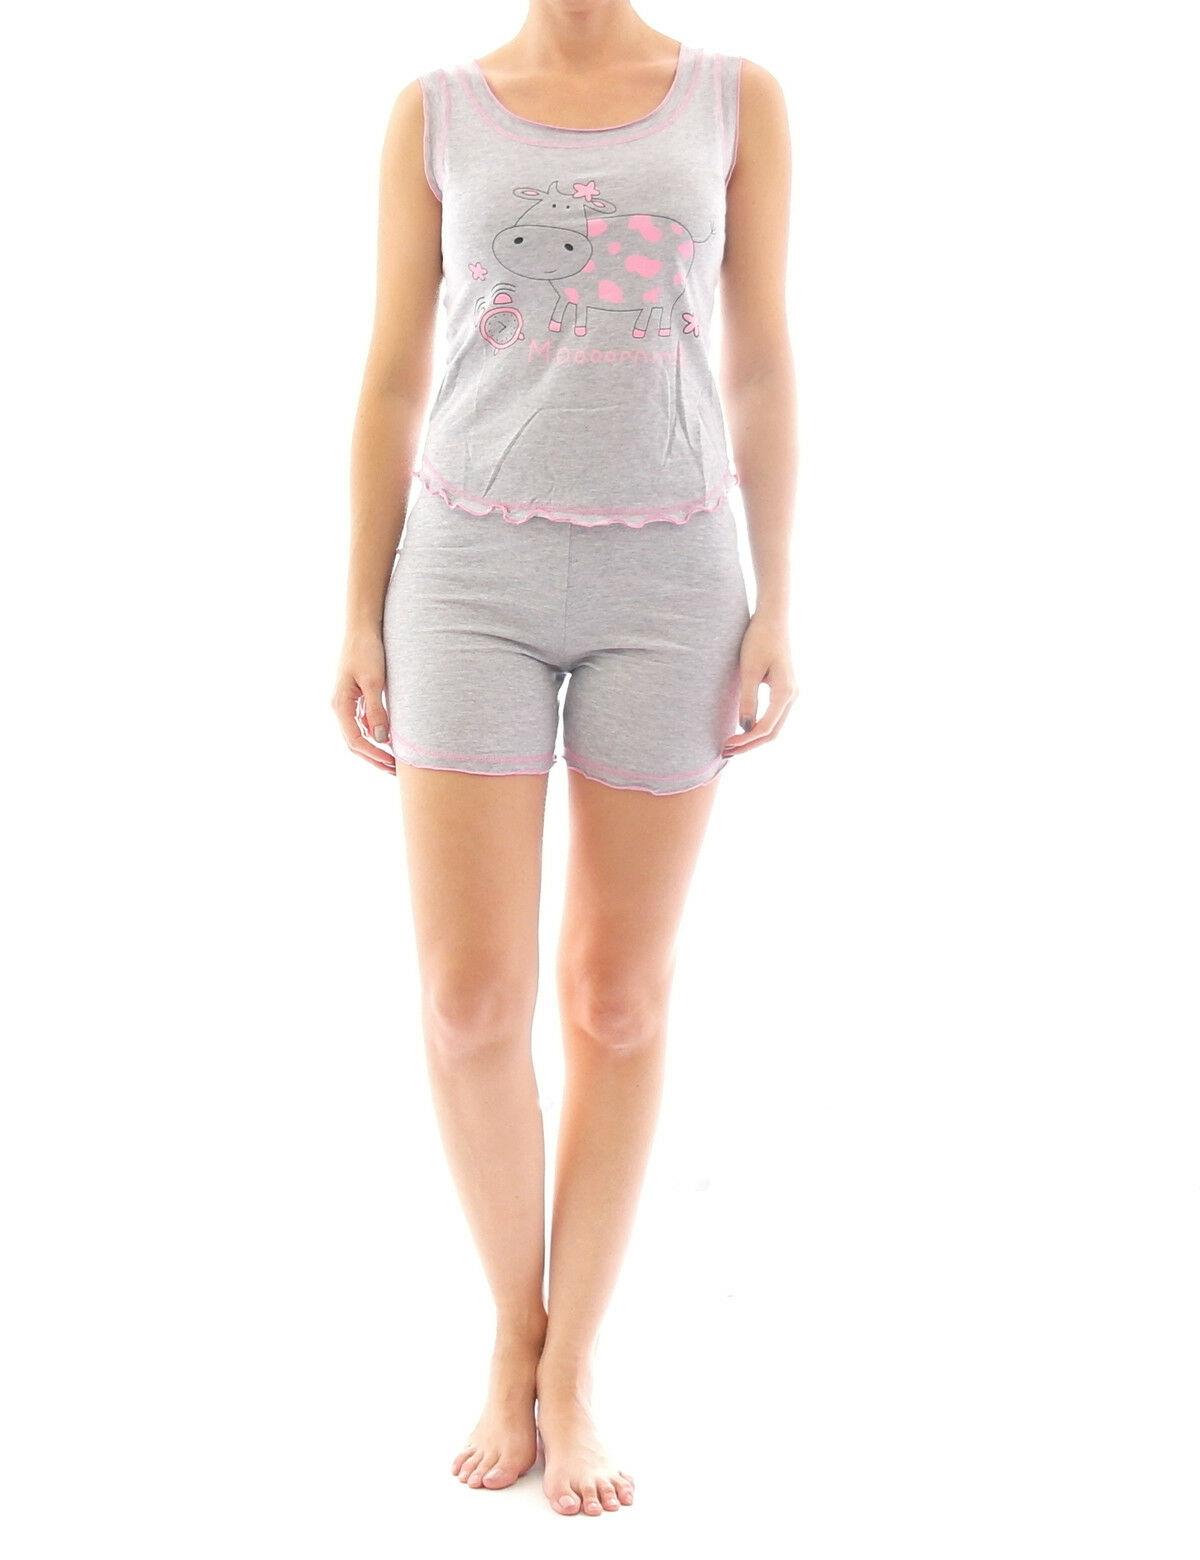 finest selection 610fb dec94 Damen Pyjama Schlafanzug Top Shirt Kurzarm kurze Shorts Motiv Grau Pink